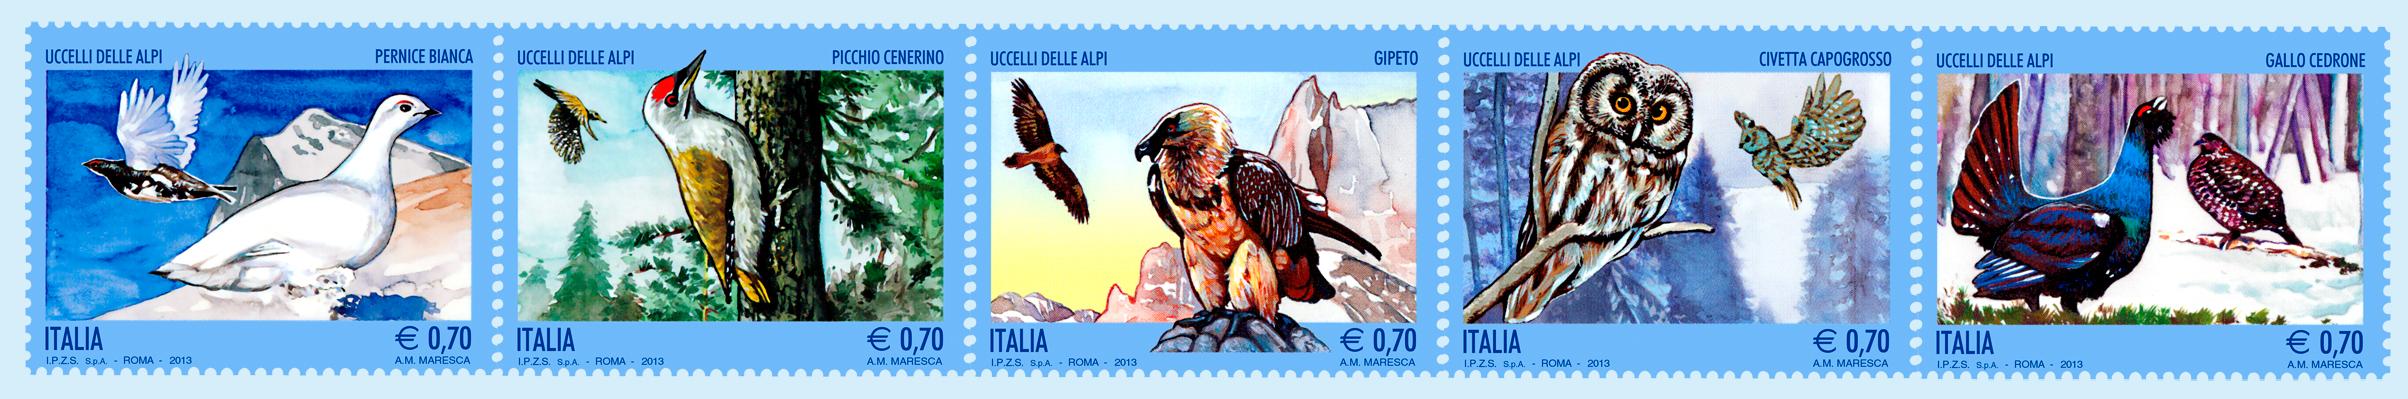 59. francobolli uccelli delle alpi